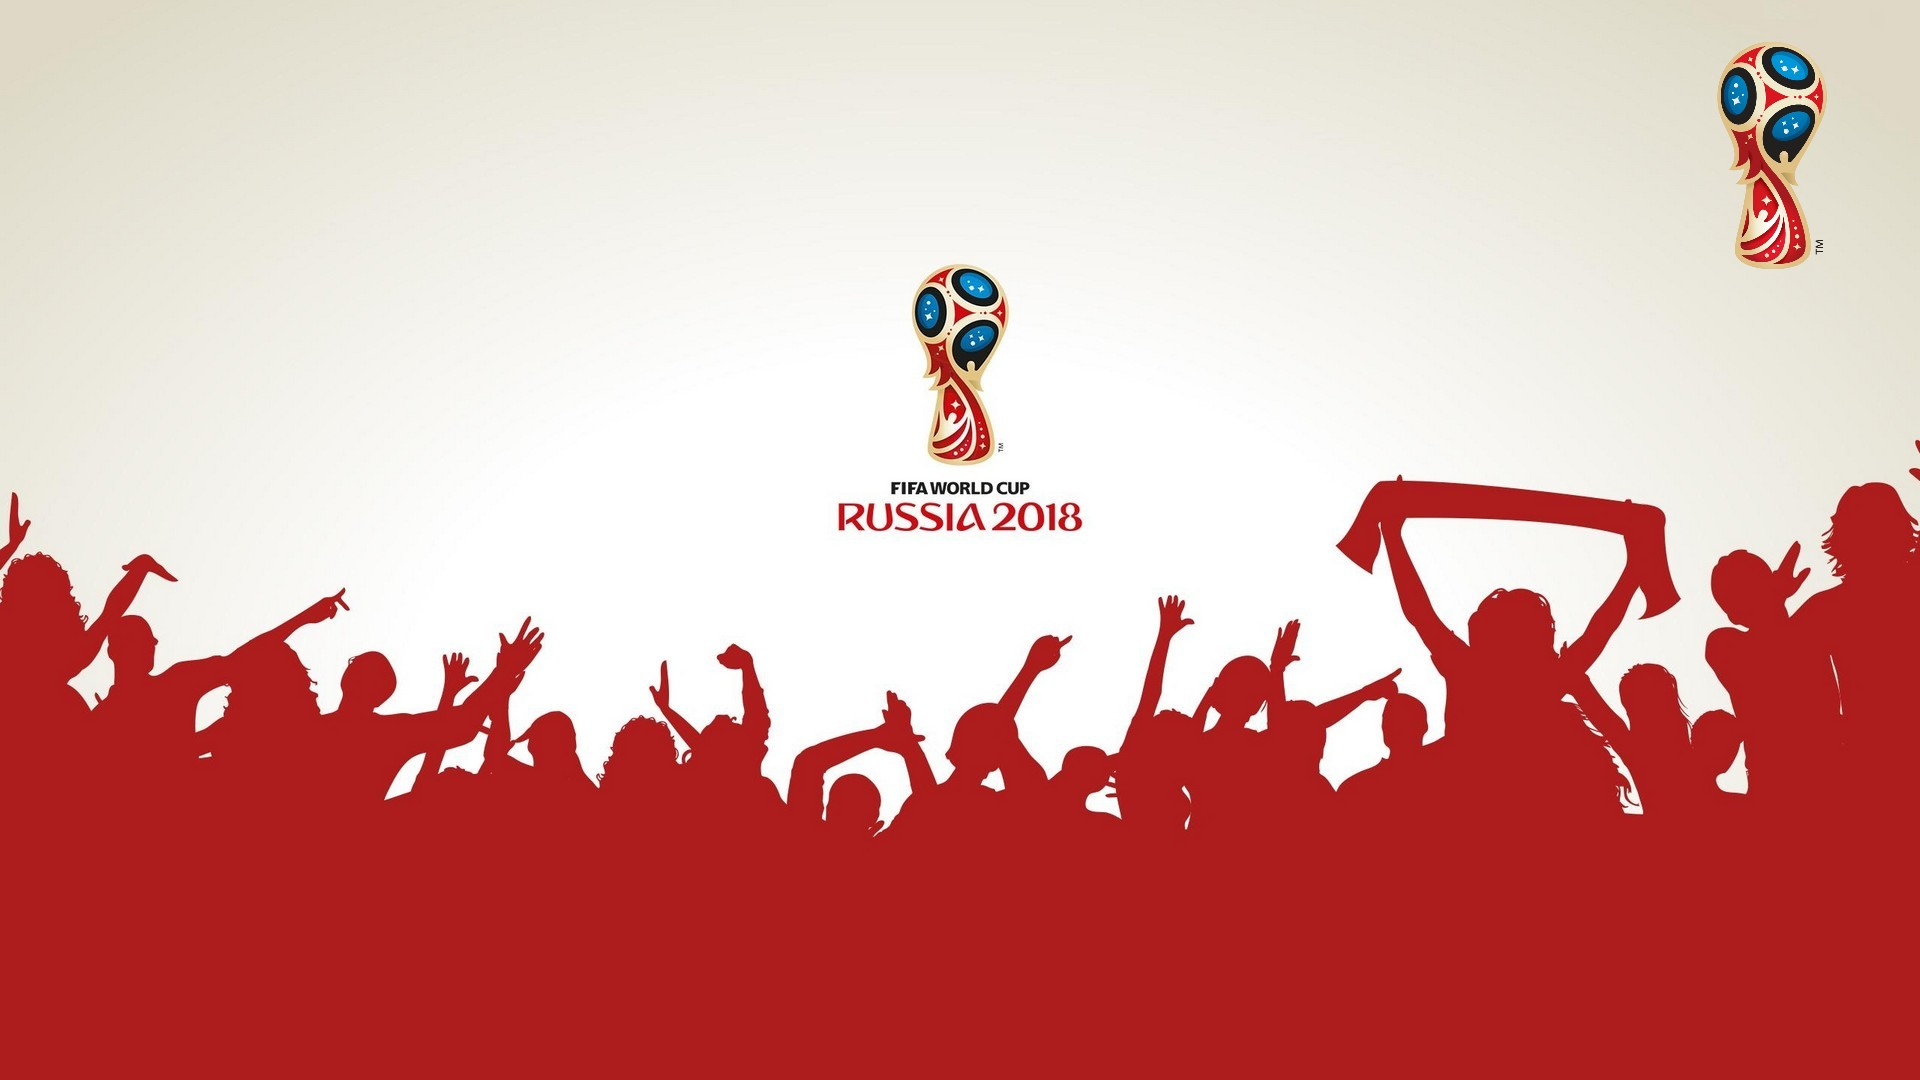 Wallpapers HD FIFA World Cup 2021 Football Wallpaper 1920x1080